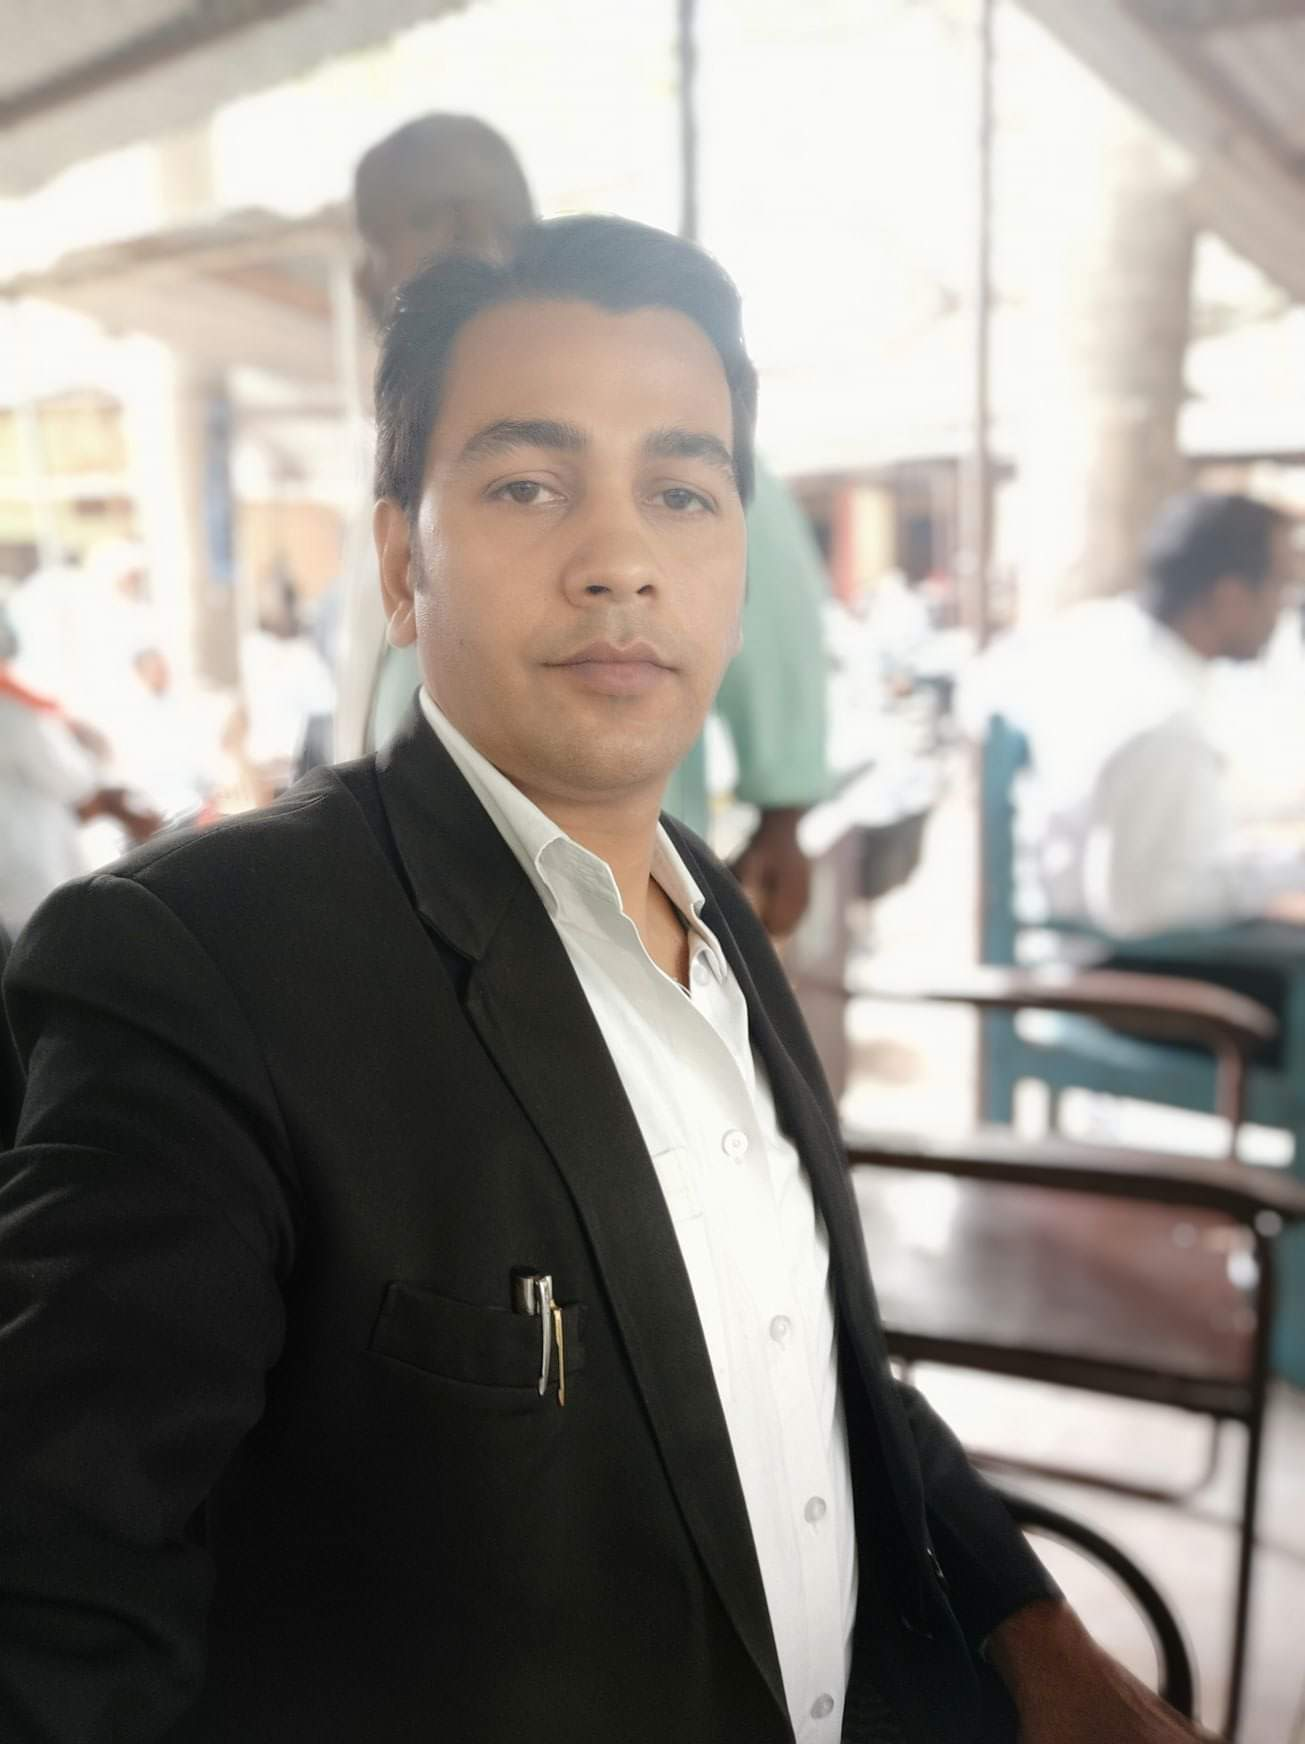 Kumar vikram Chaubey